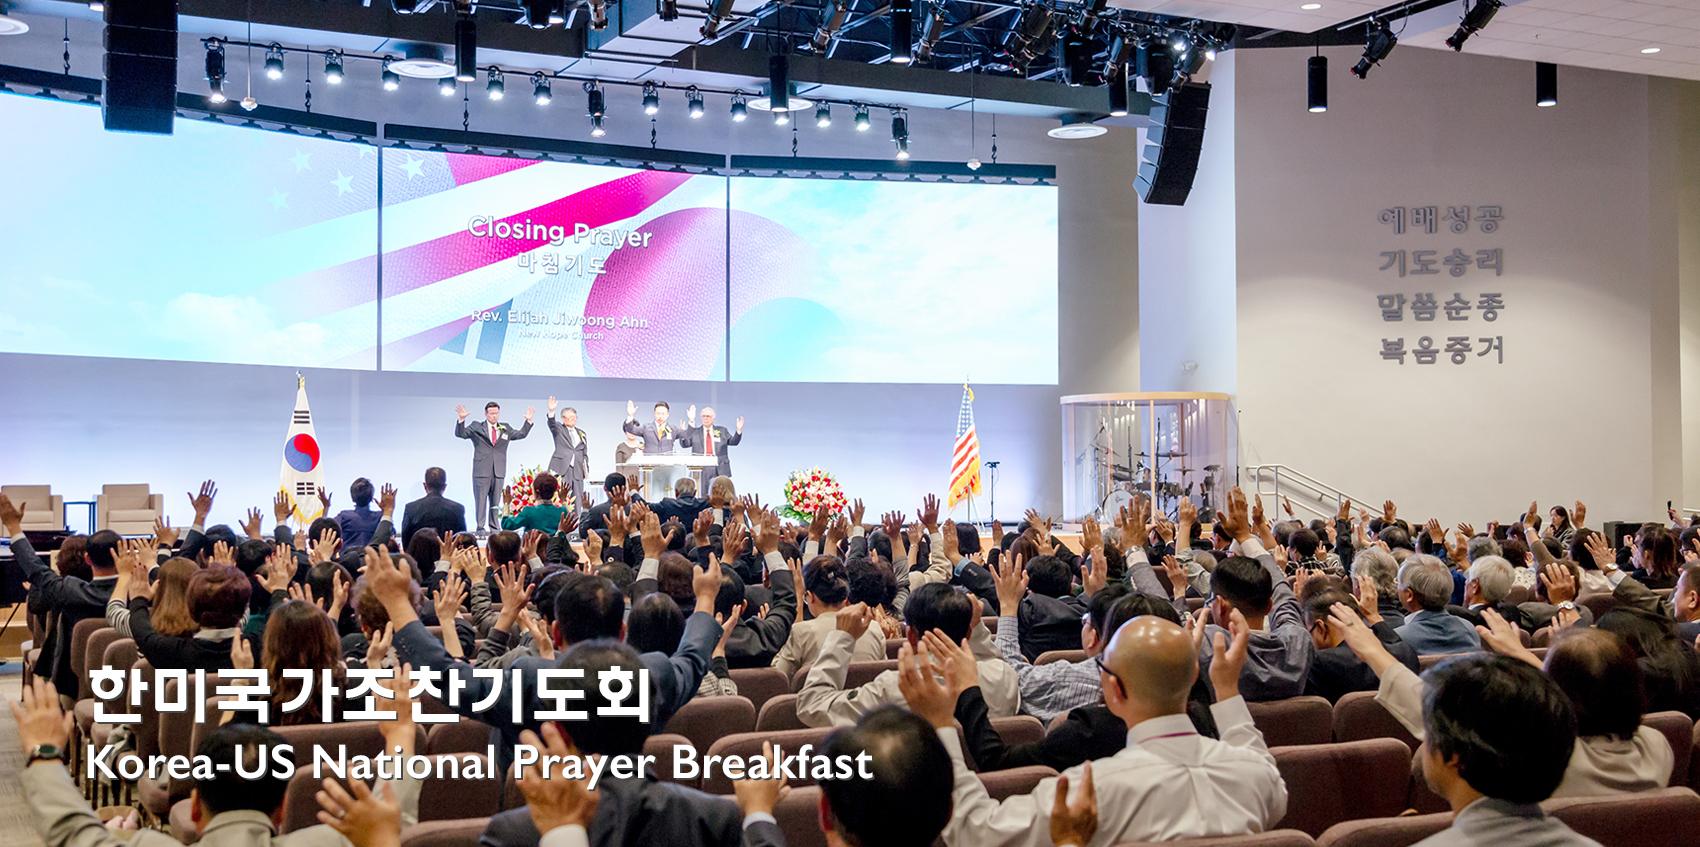 Korea-US National Prayer Breakfast